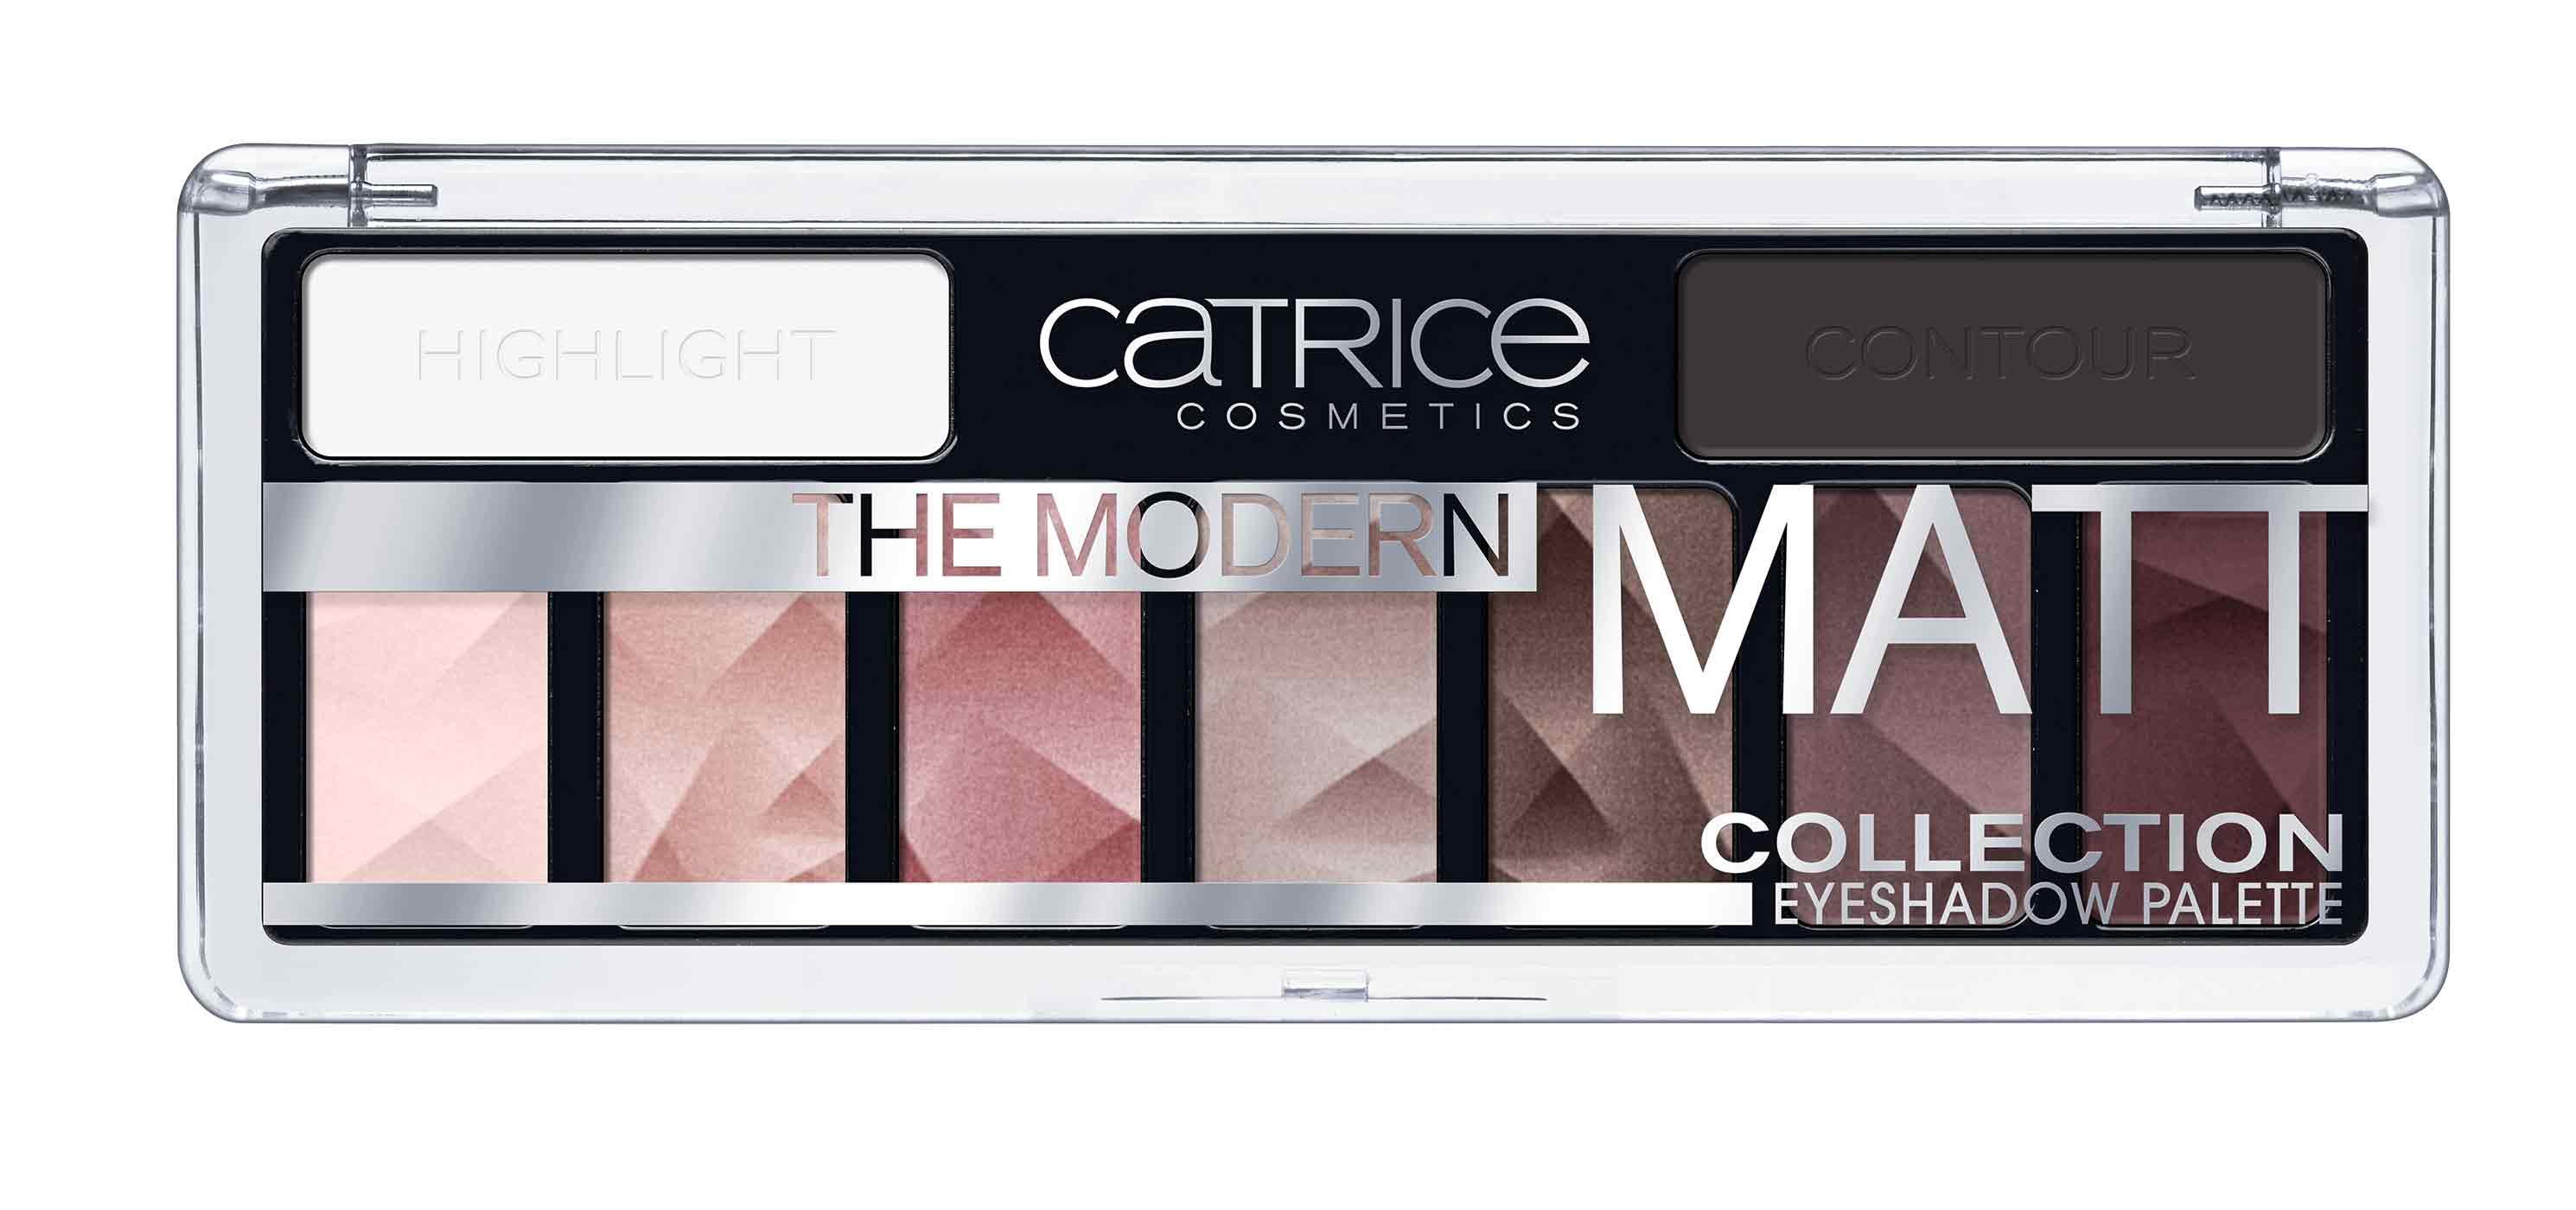 catr_the-collection_eyeshadow-palette_modern-matt_1477665767